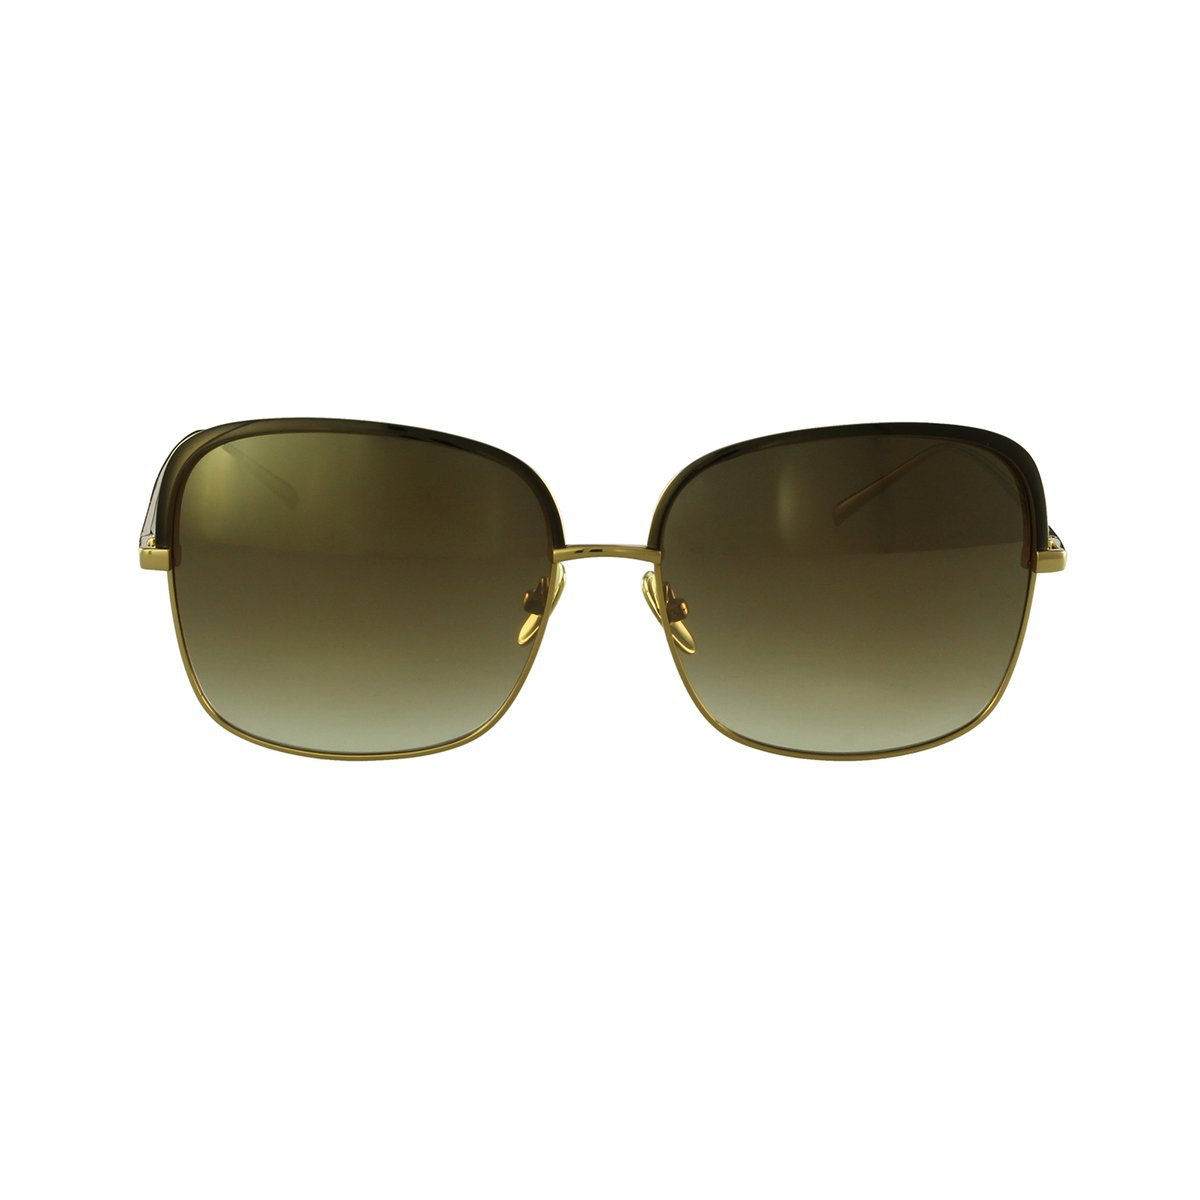 41412ce3cf46d Óculos De Sol Ana Hickmann Casual - Compre Agora   Netshoes